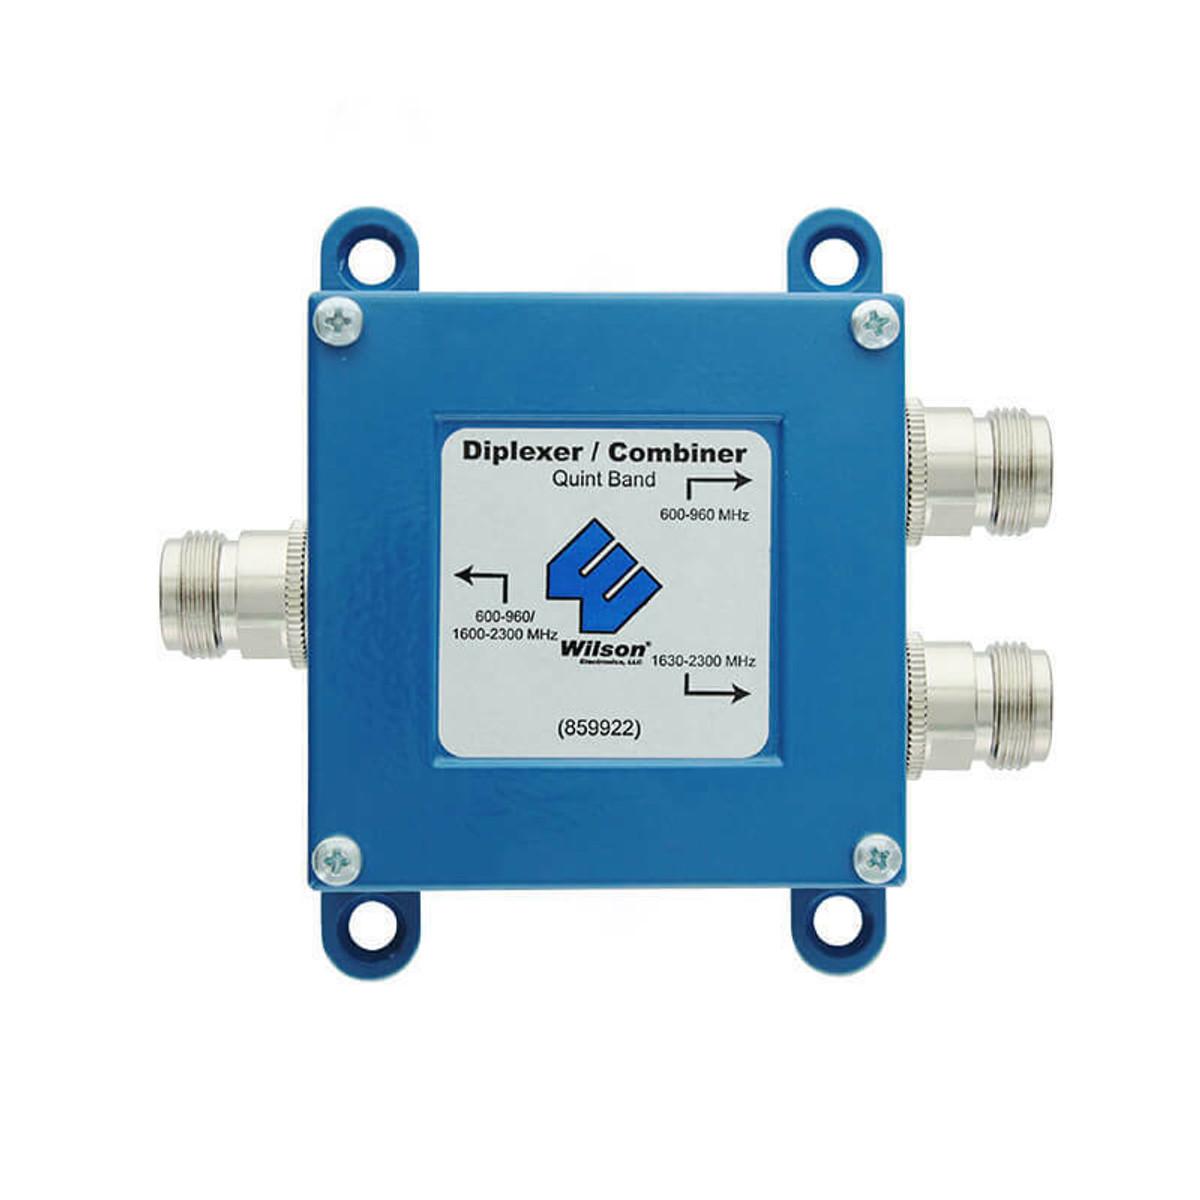 weBoost (Wilson) 859922 Quint Band Combiner / Diplexer for 700-2100MHz